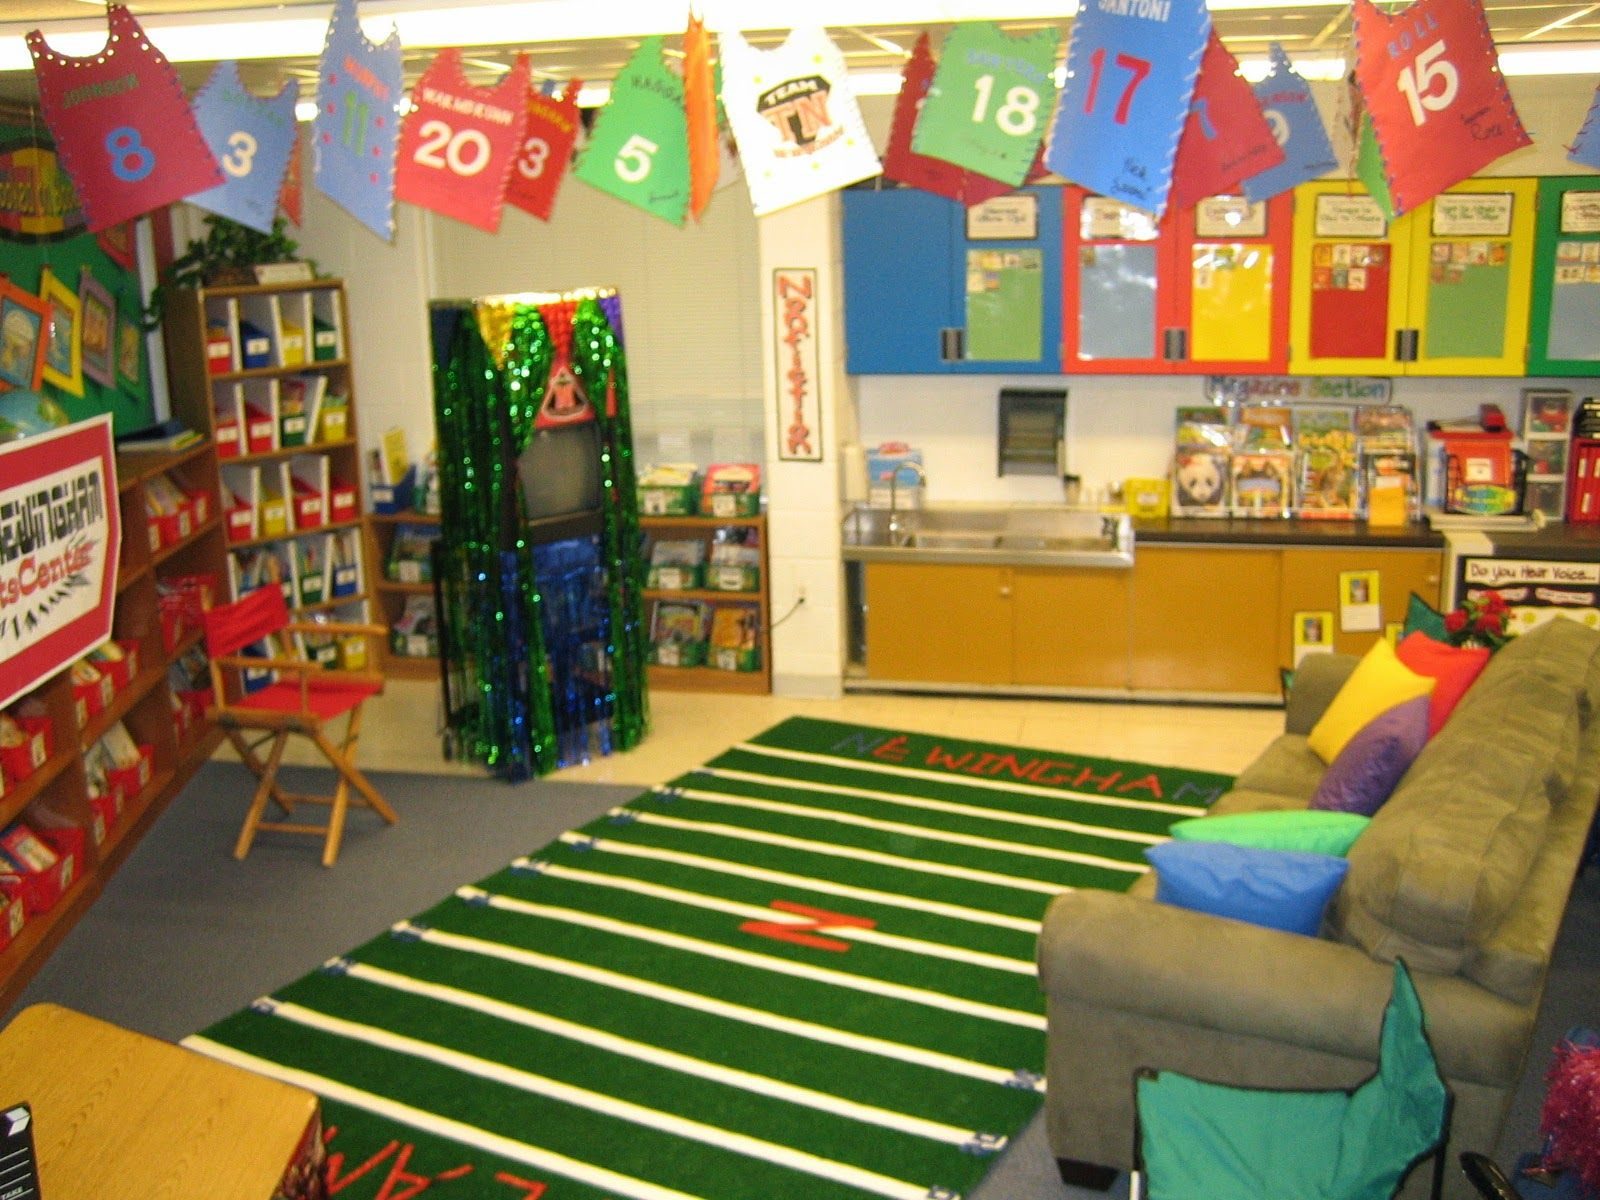 Yellow Classroom Decor : Sports themed classroom ideas & printable classroom decorations